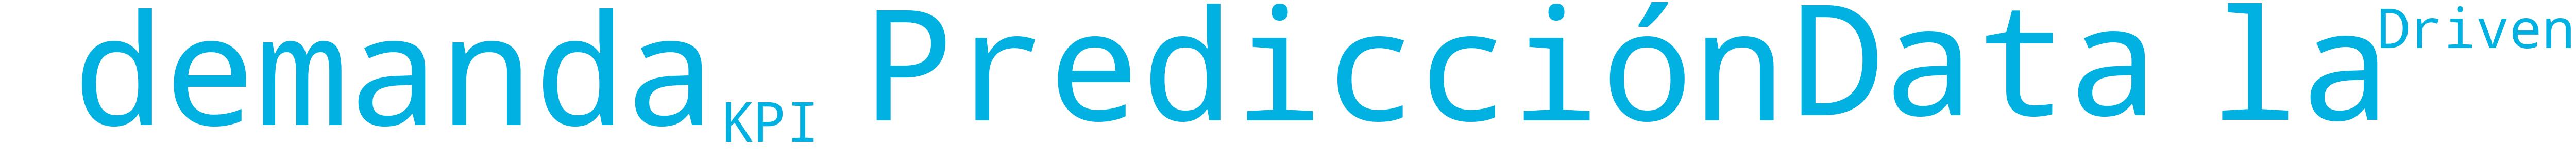 %%tb-image-alt-text%%